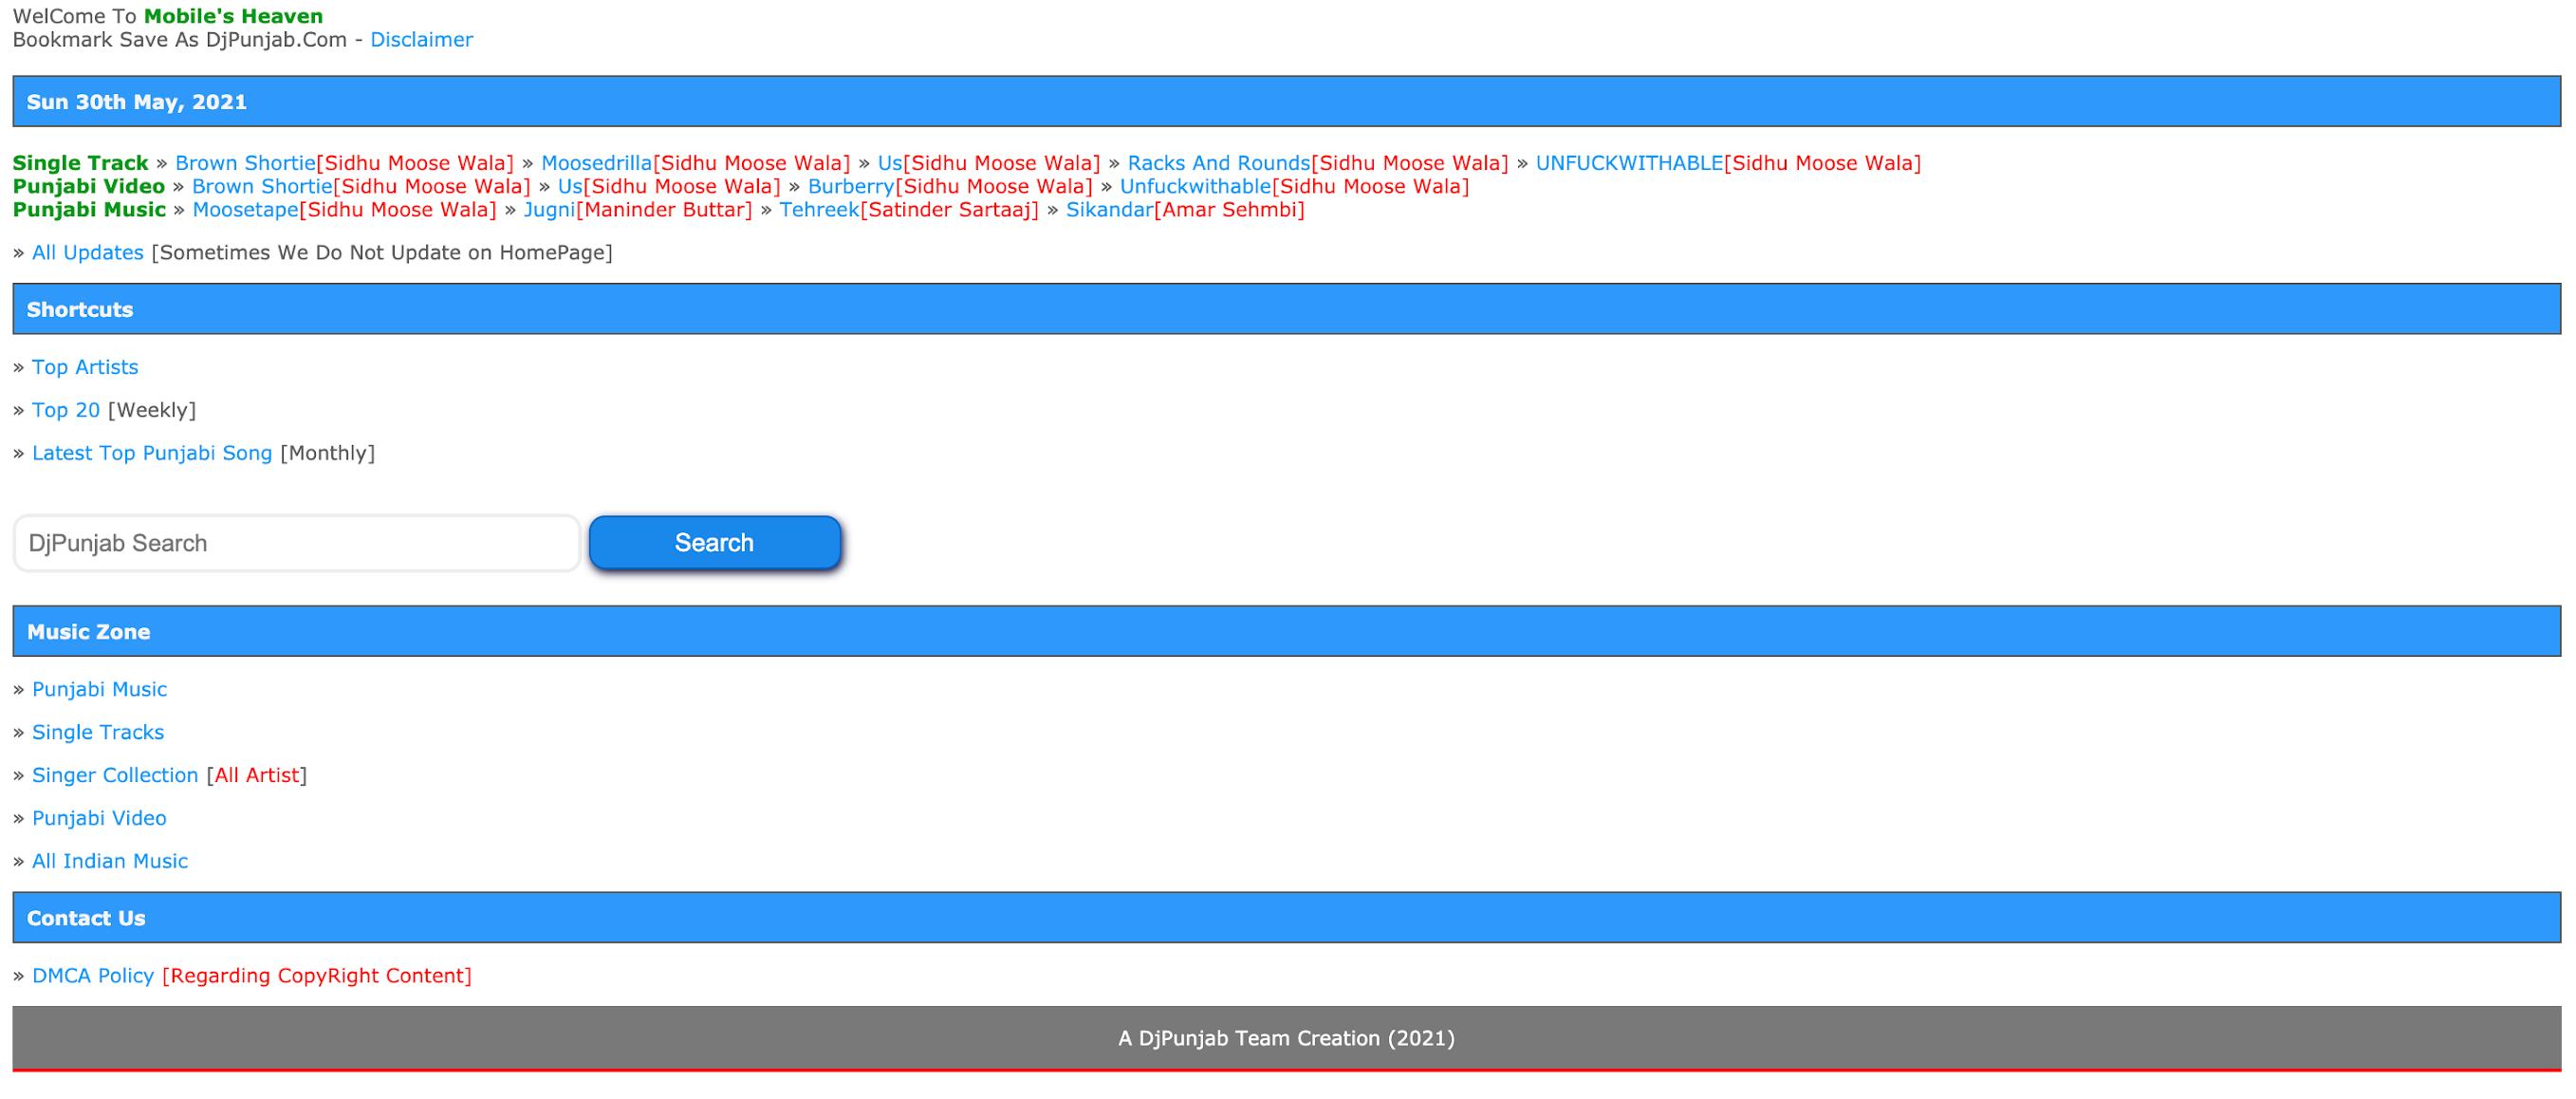 DJPunjab 2021 website